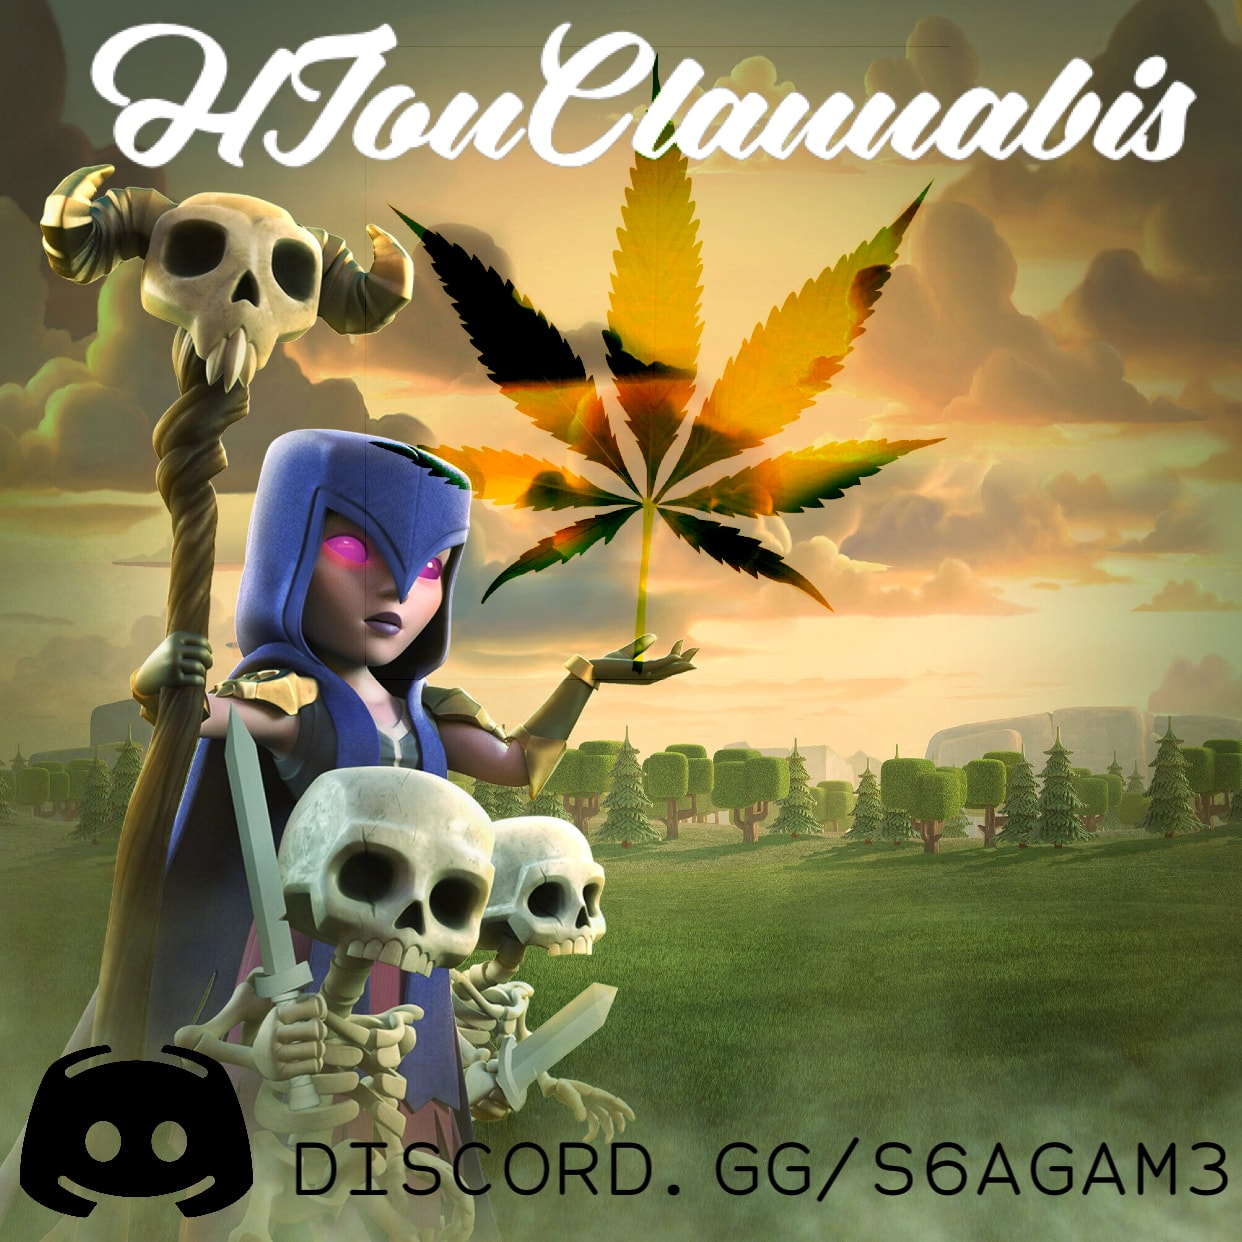 HIonClannabis